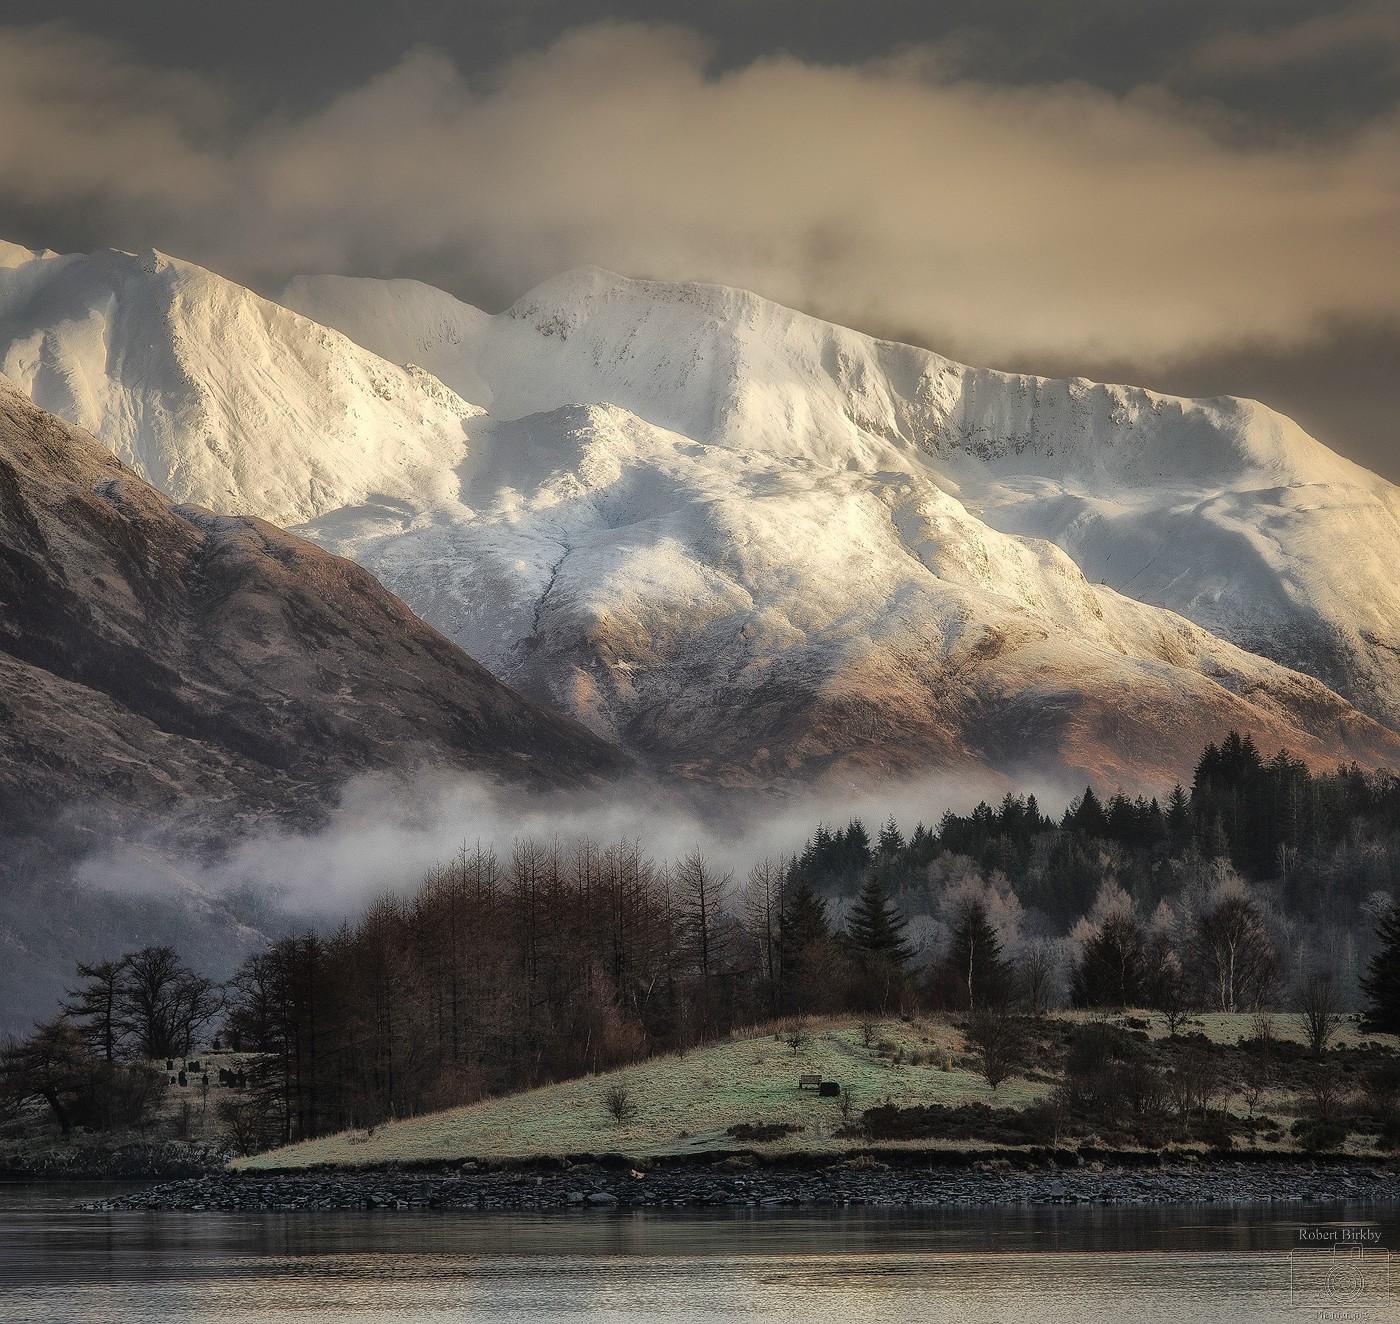 Lochaber Light - Scotland Landscapes (also see Seascapes portfolio)